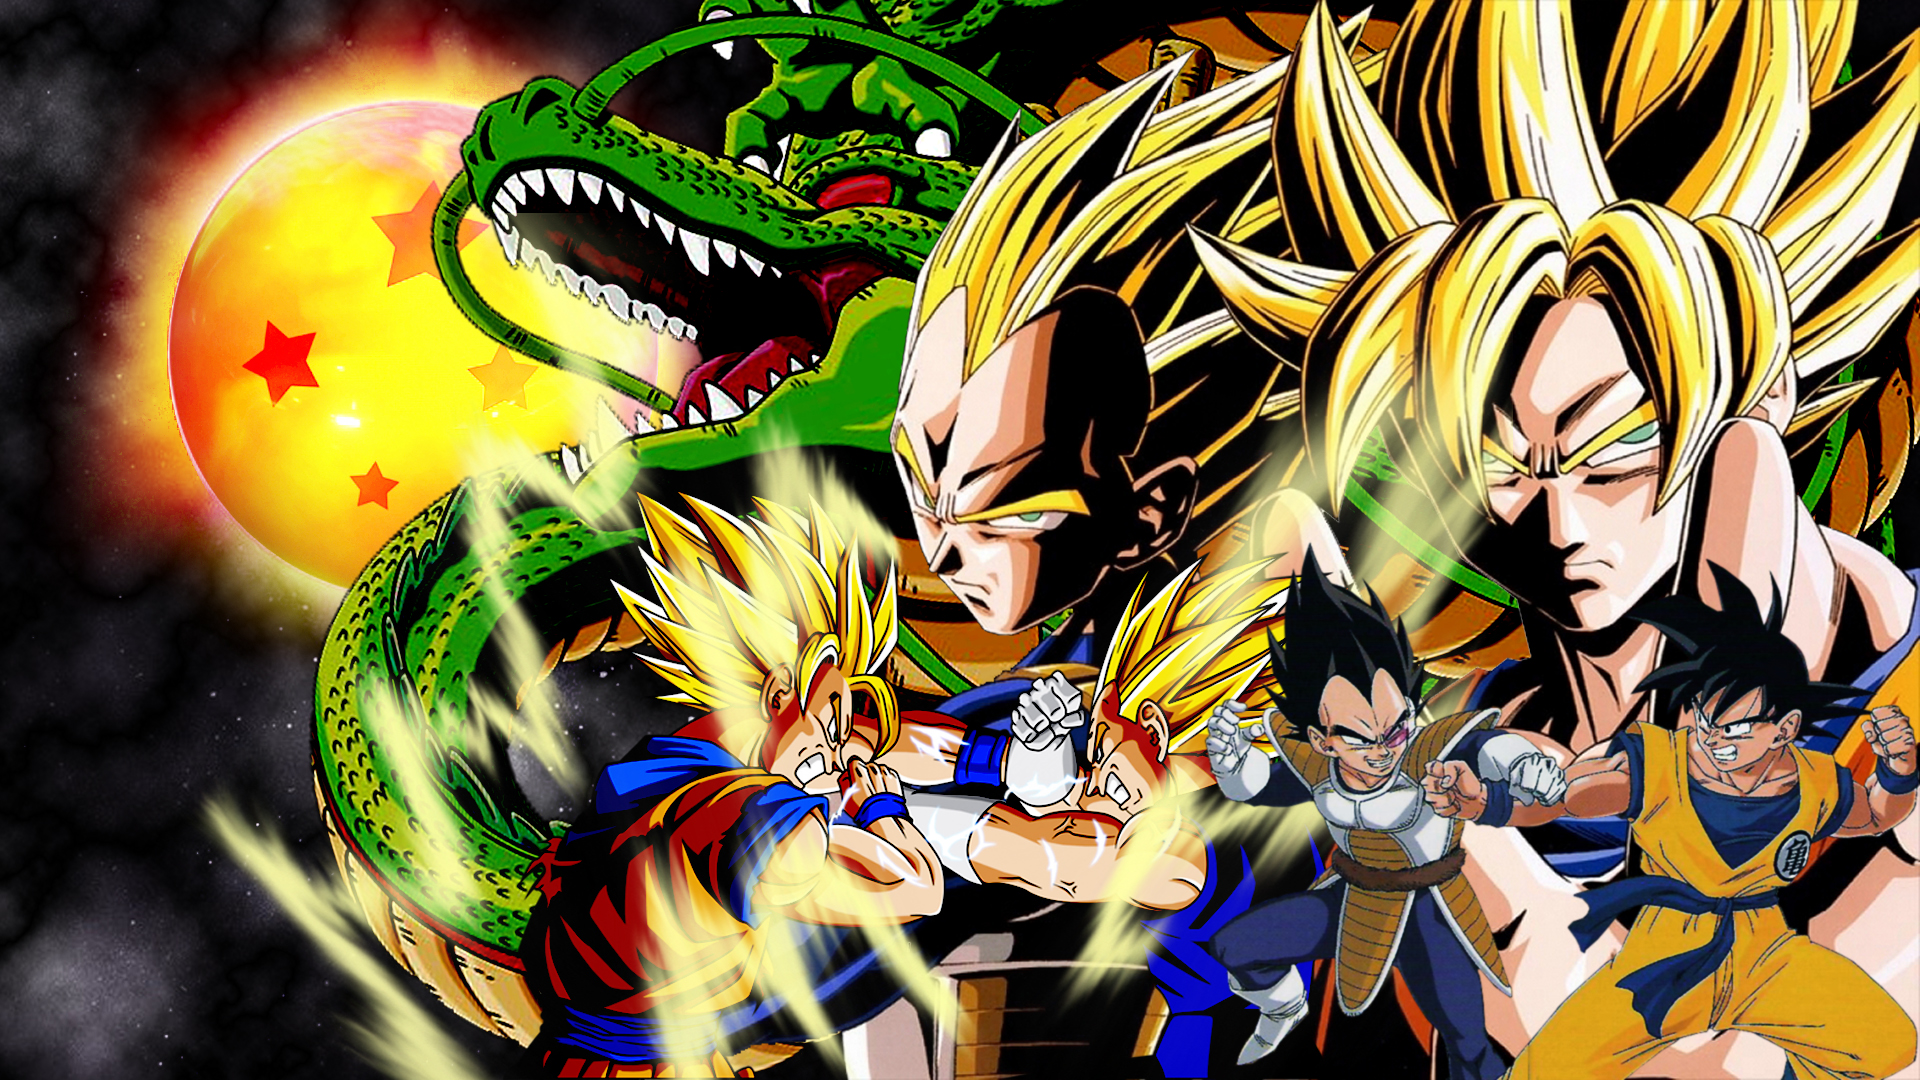 Goku Vs Vegeta Wallpaper By VuLC4no